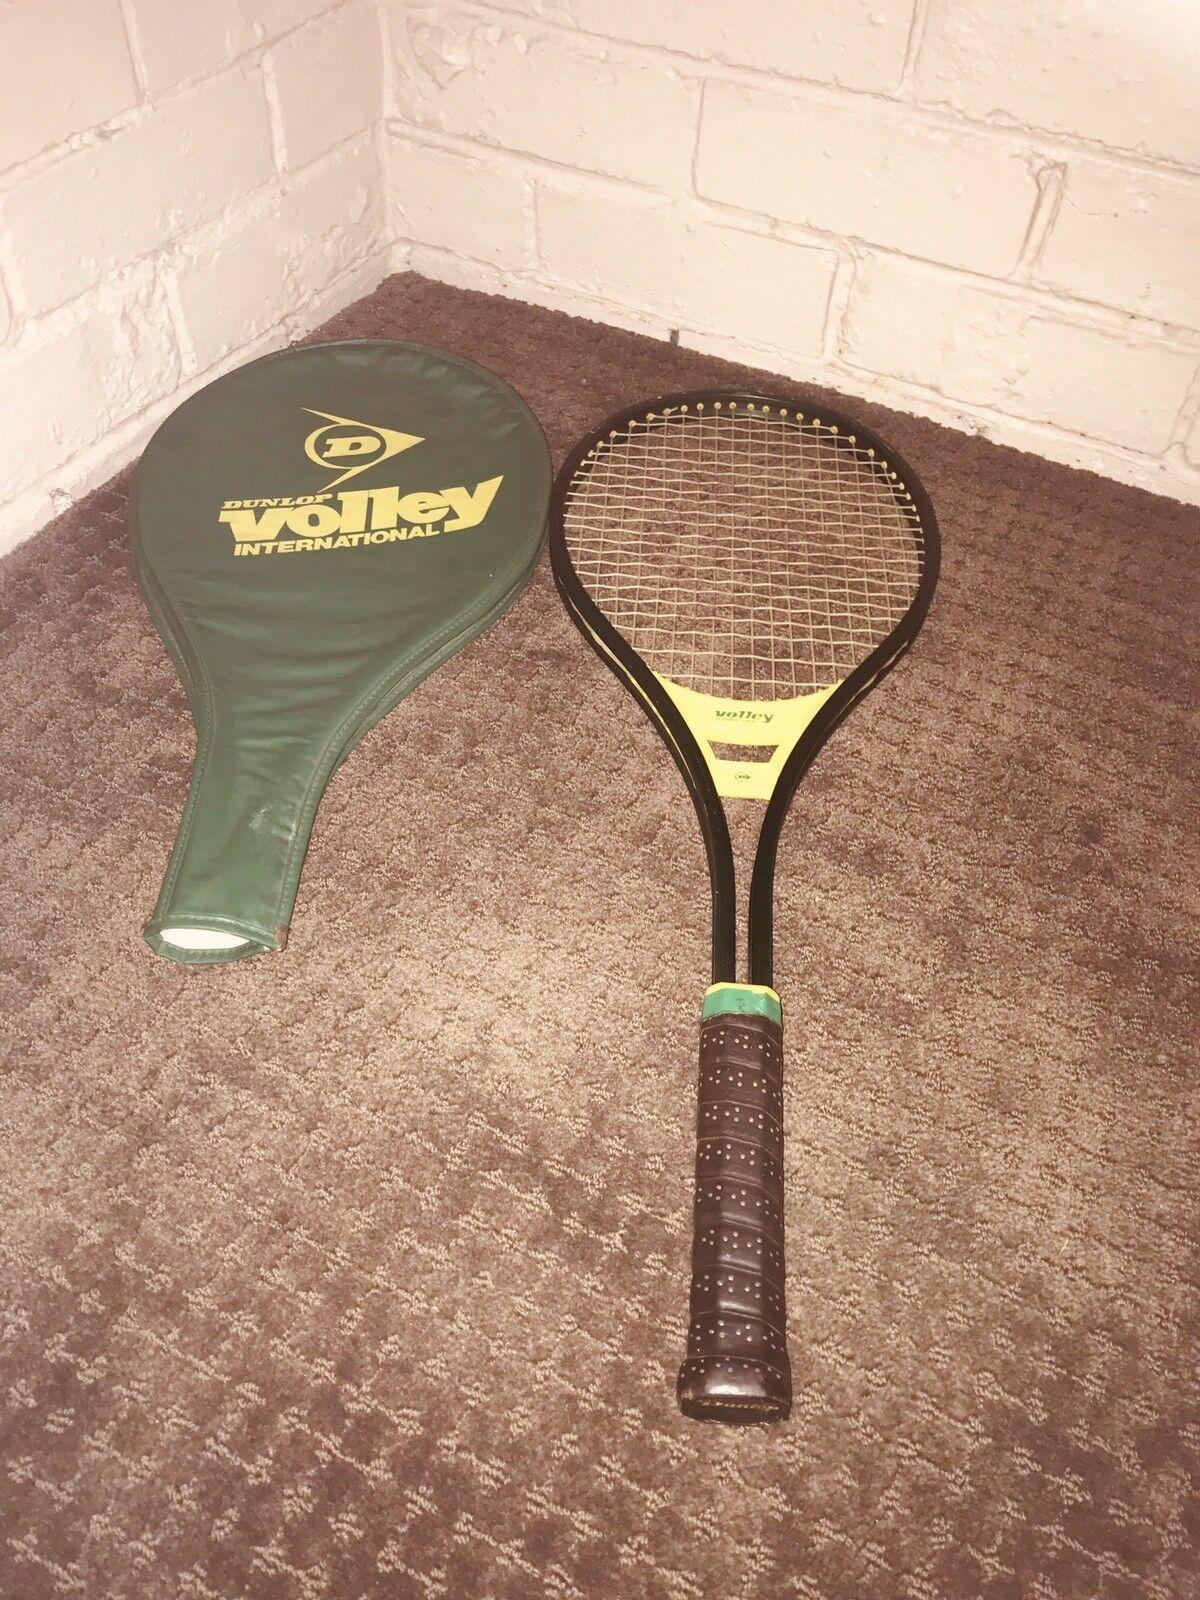 Dunlop Volley International Vintage Tennis Racquet In Excellent Condition